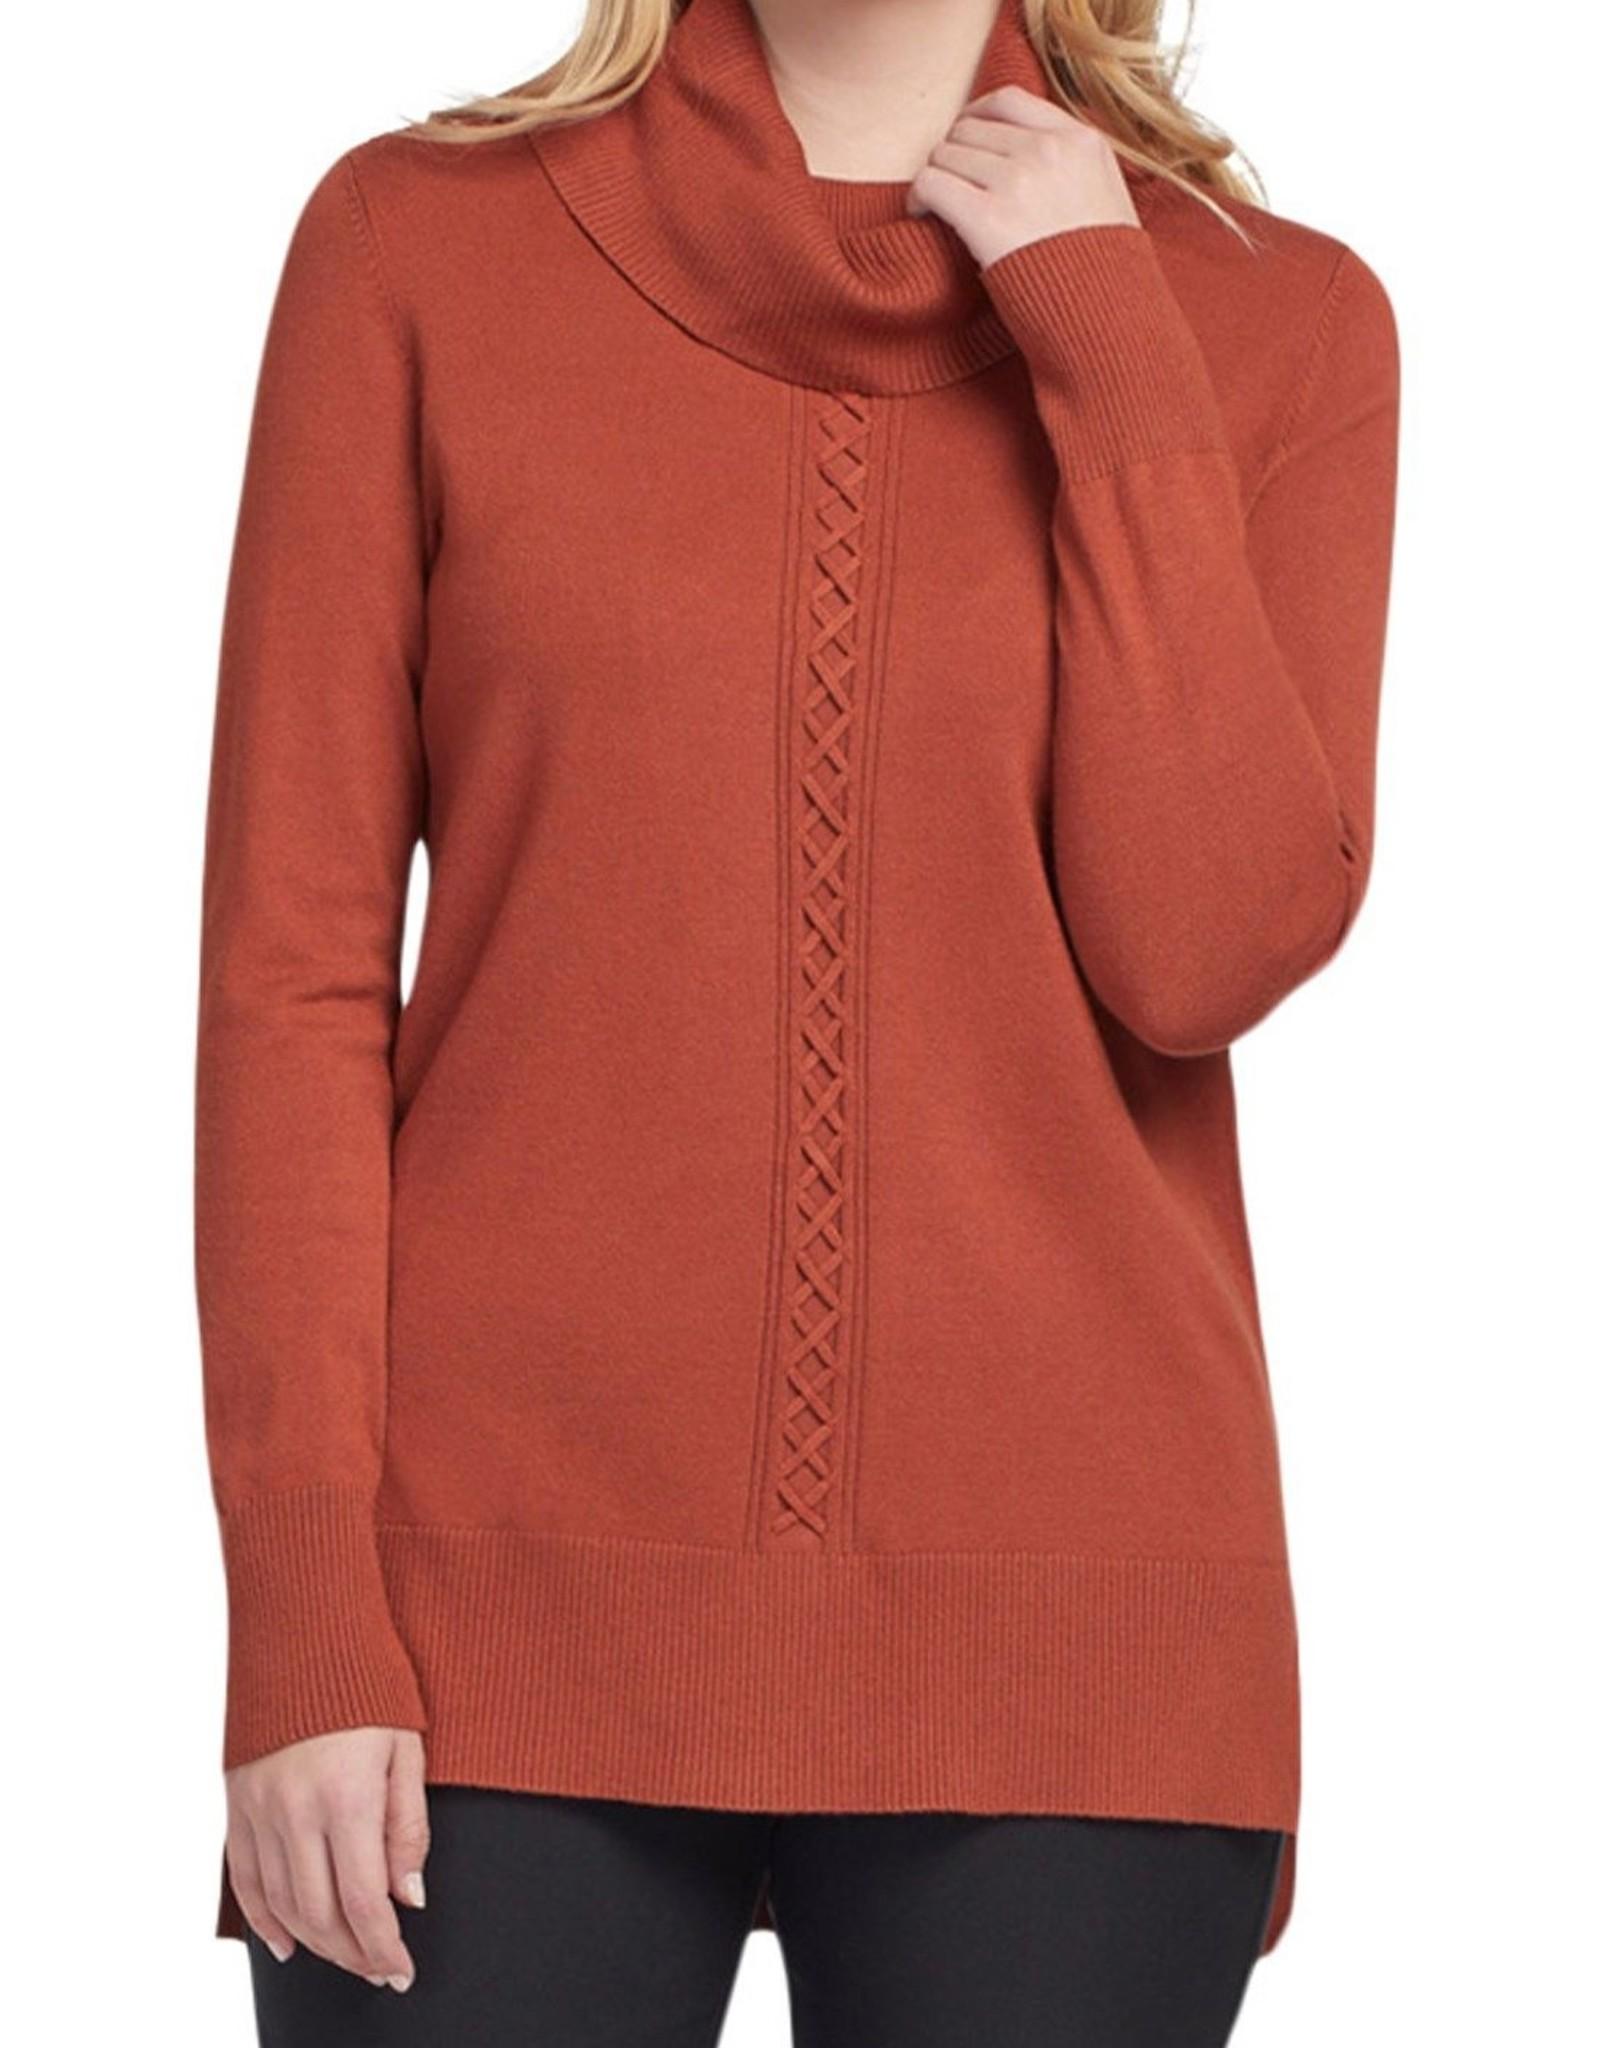 Tribal Tribal Long Sleeve Cowl Neck Sweater 4703O